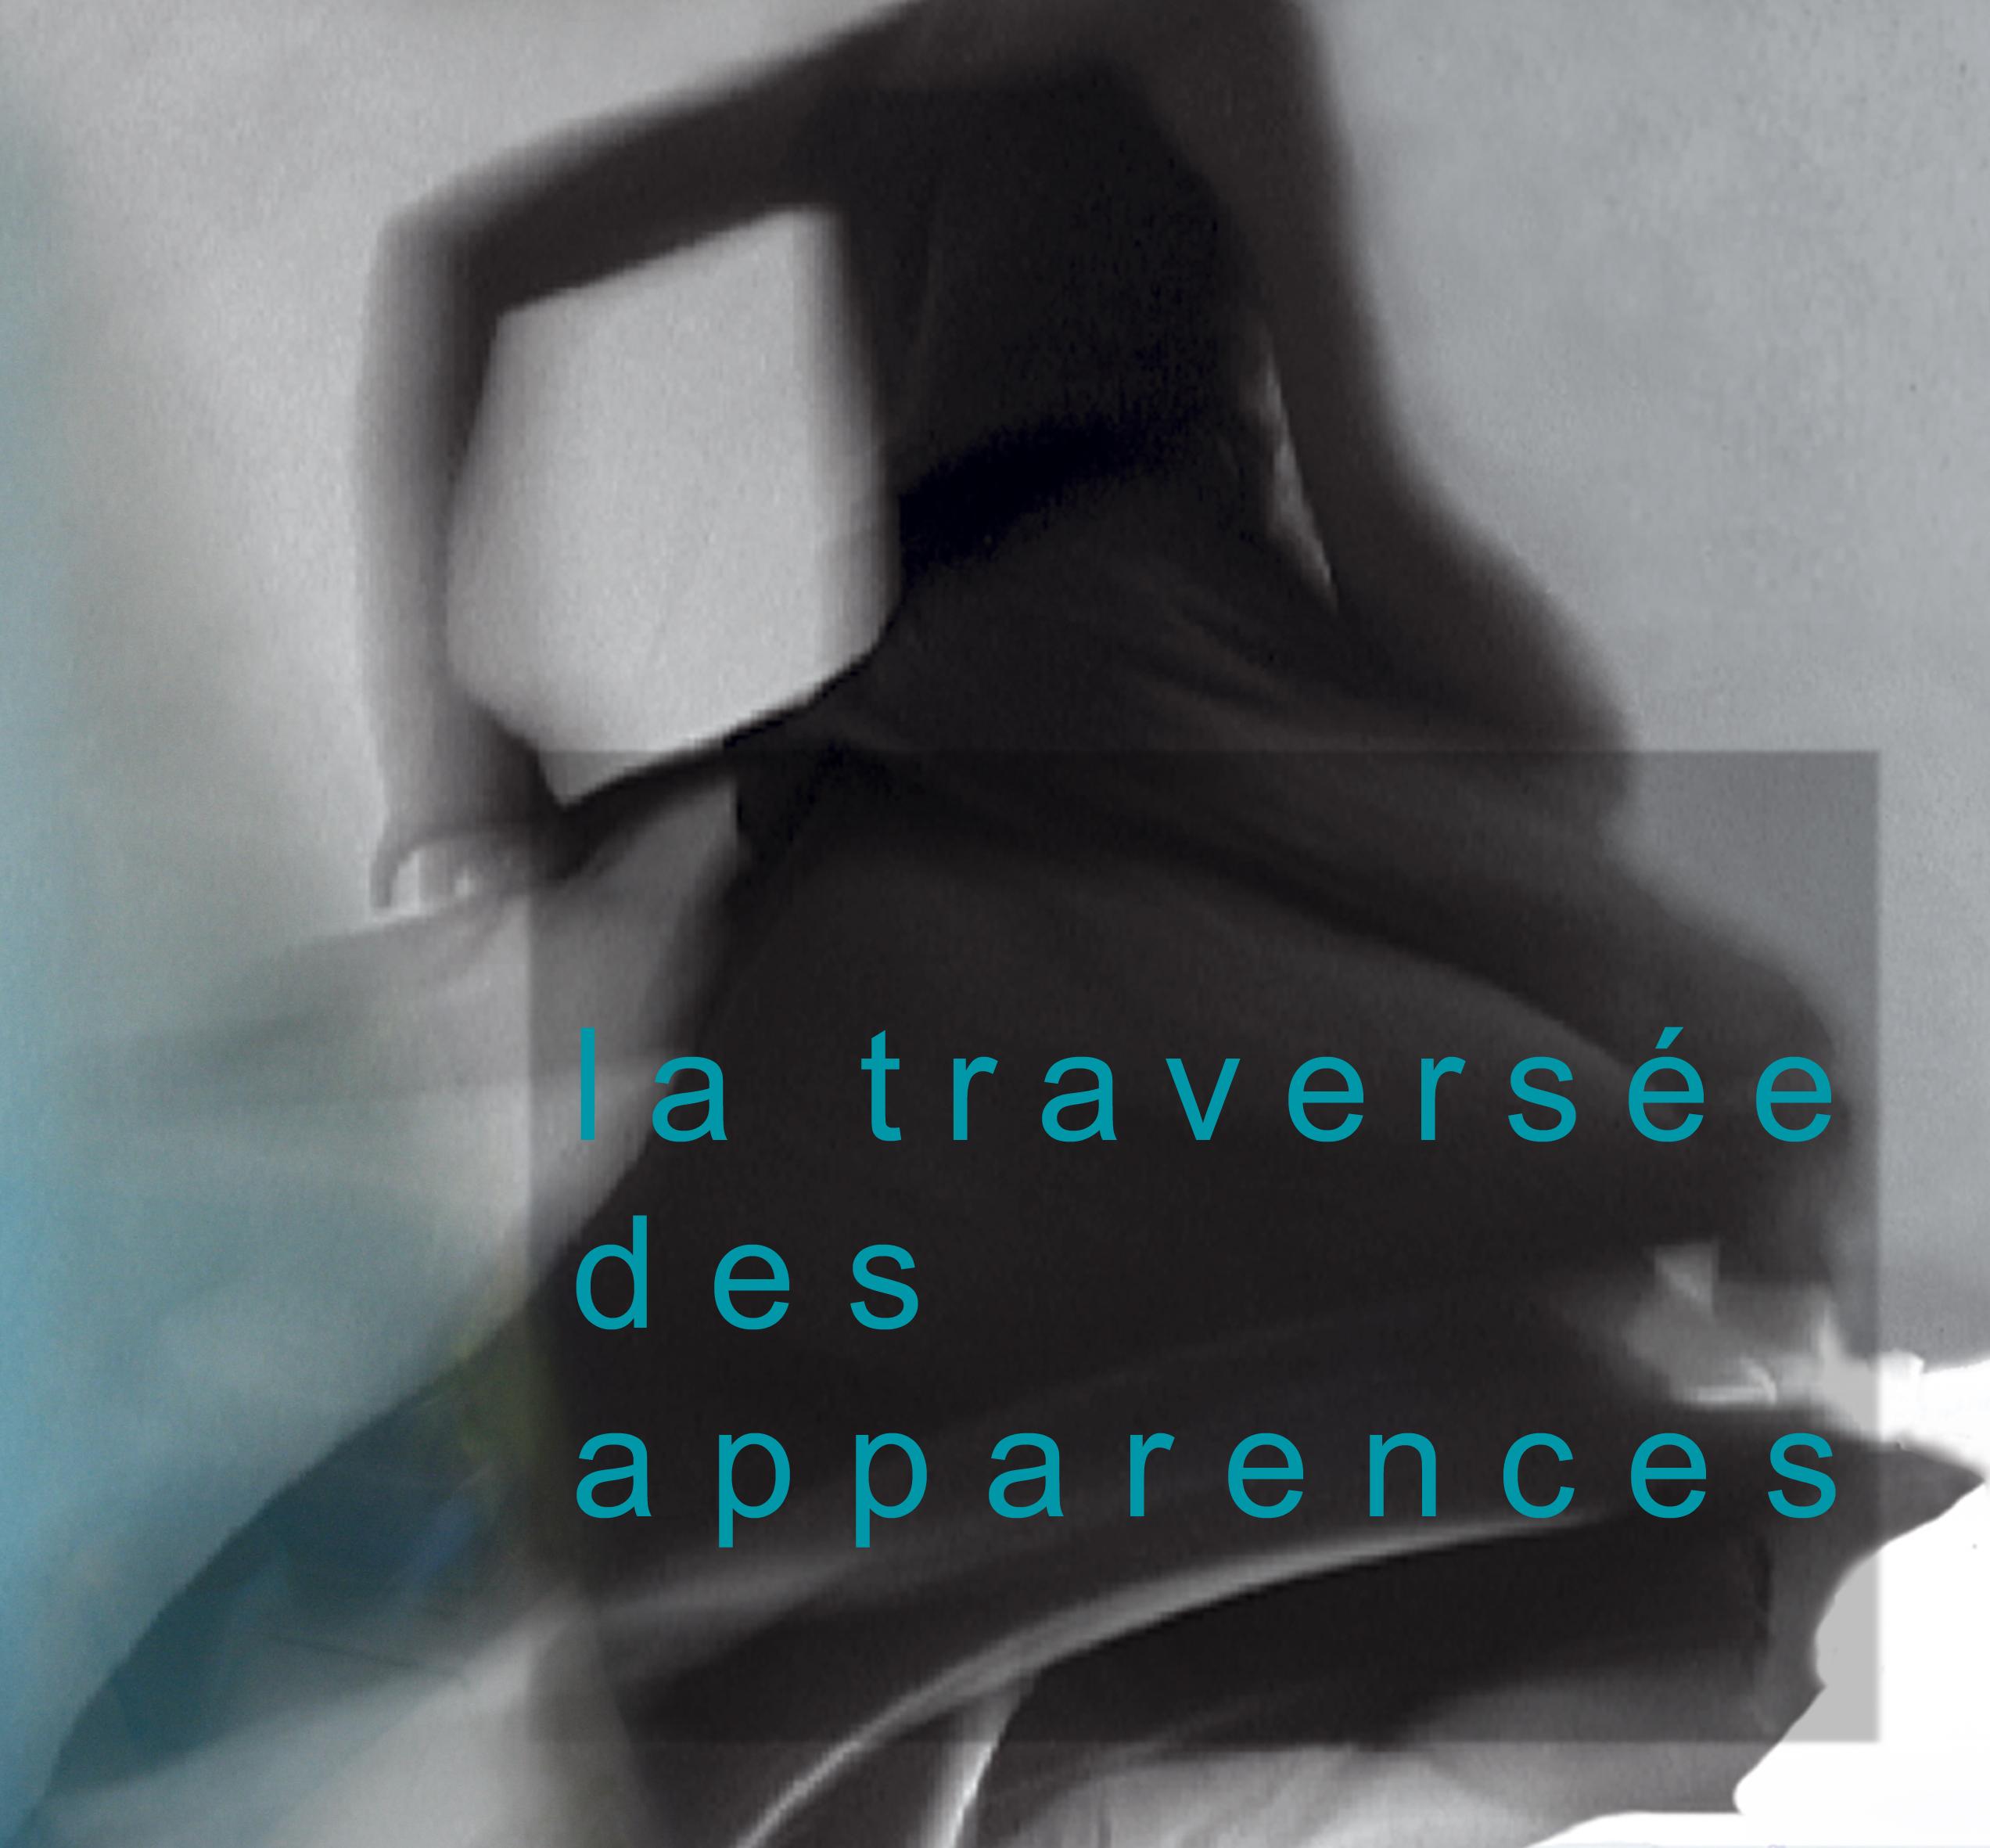 LA TRAVERSEE DES APPARENCES